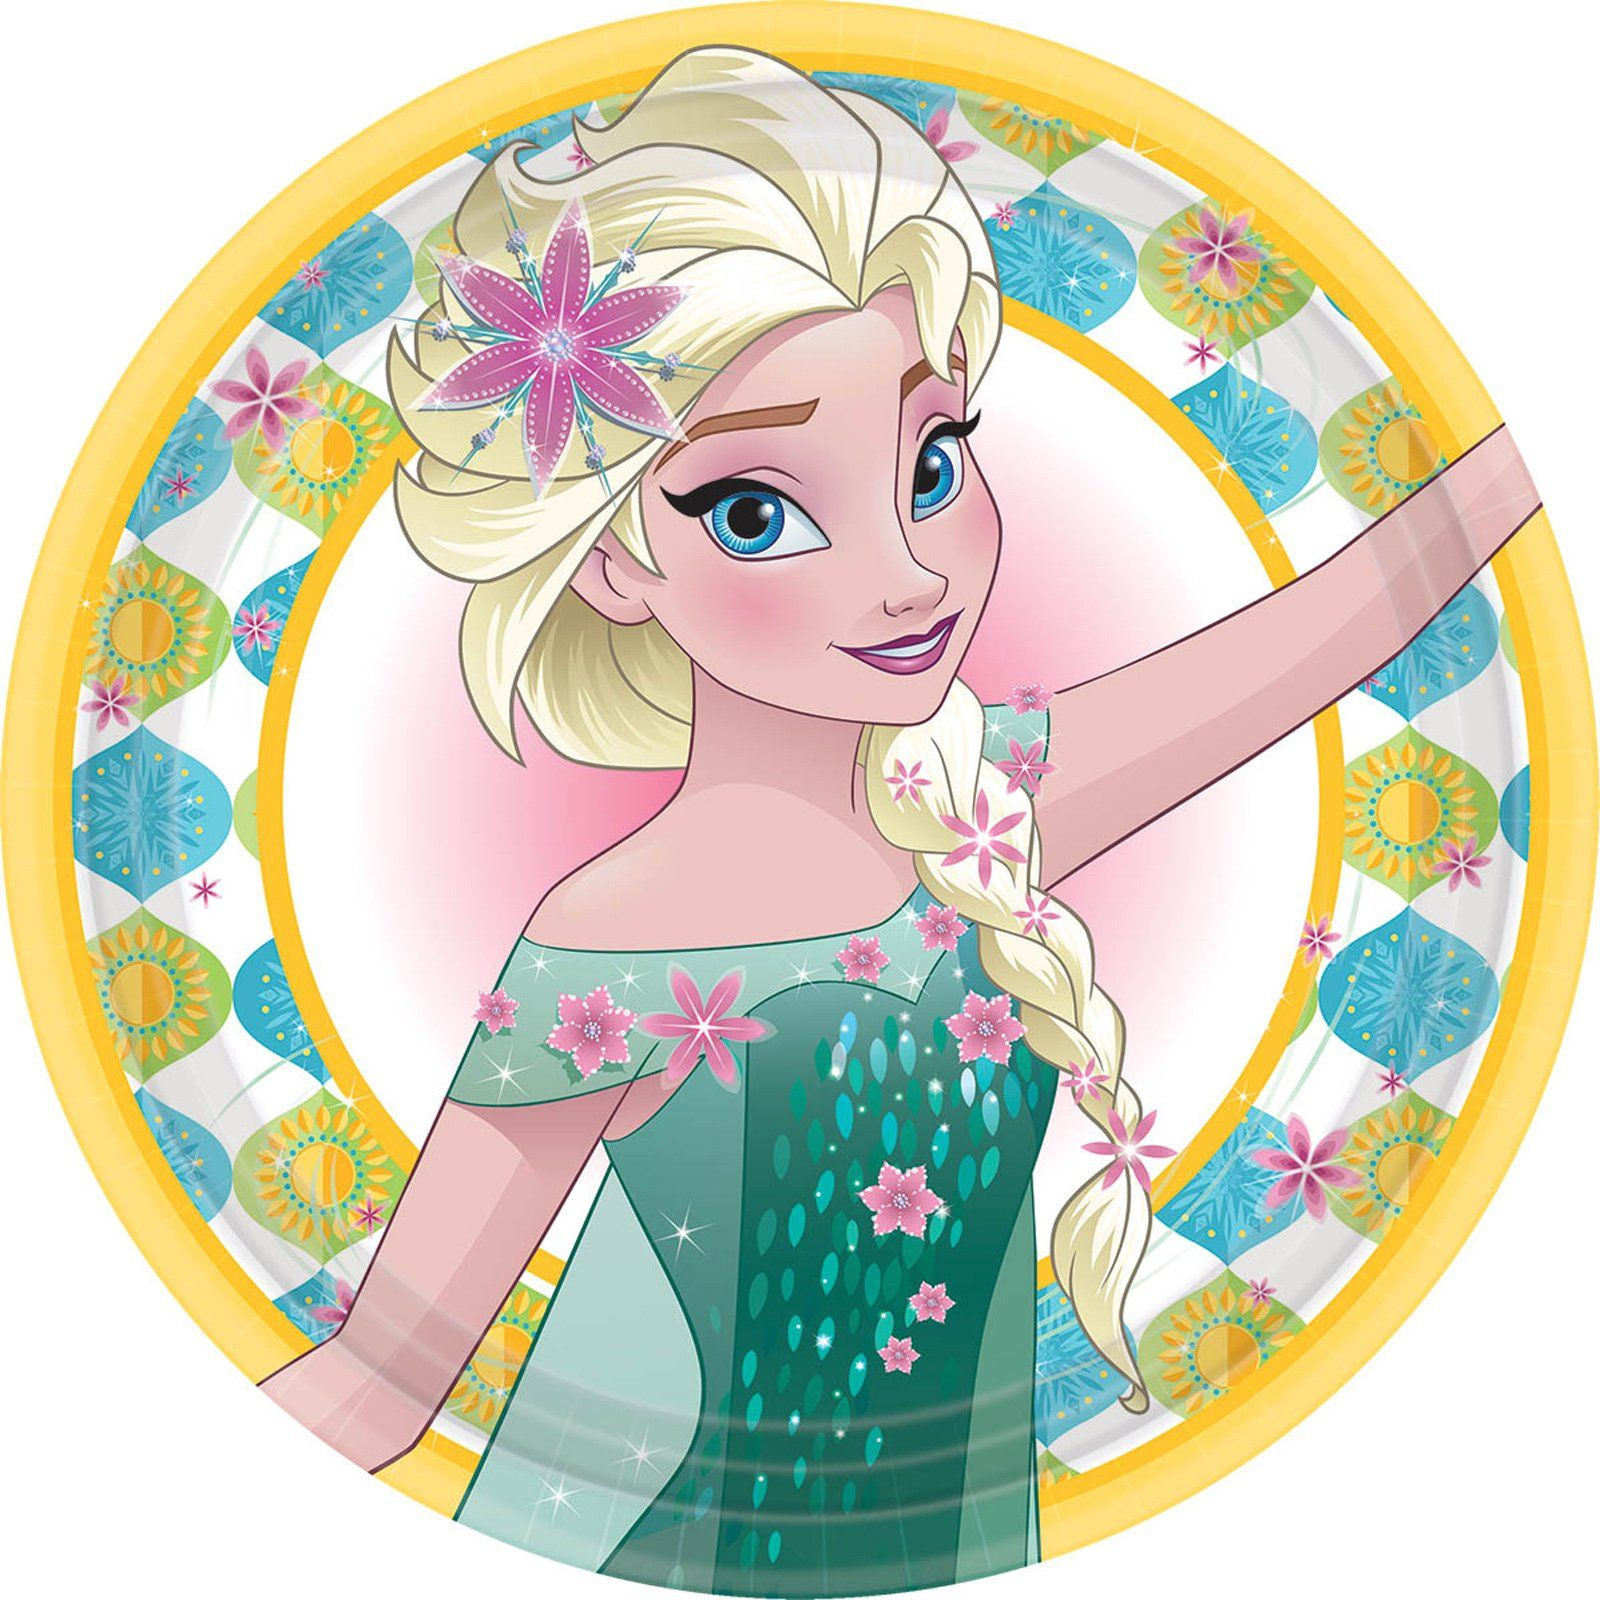 Disney Frozen Fever Dinner Plates | Princesas, Frozen de disney y De ...